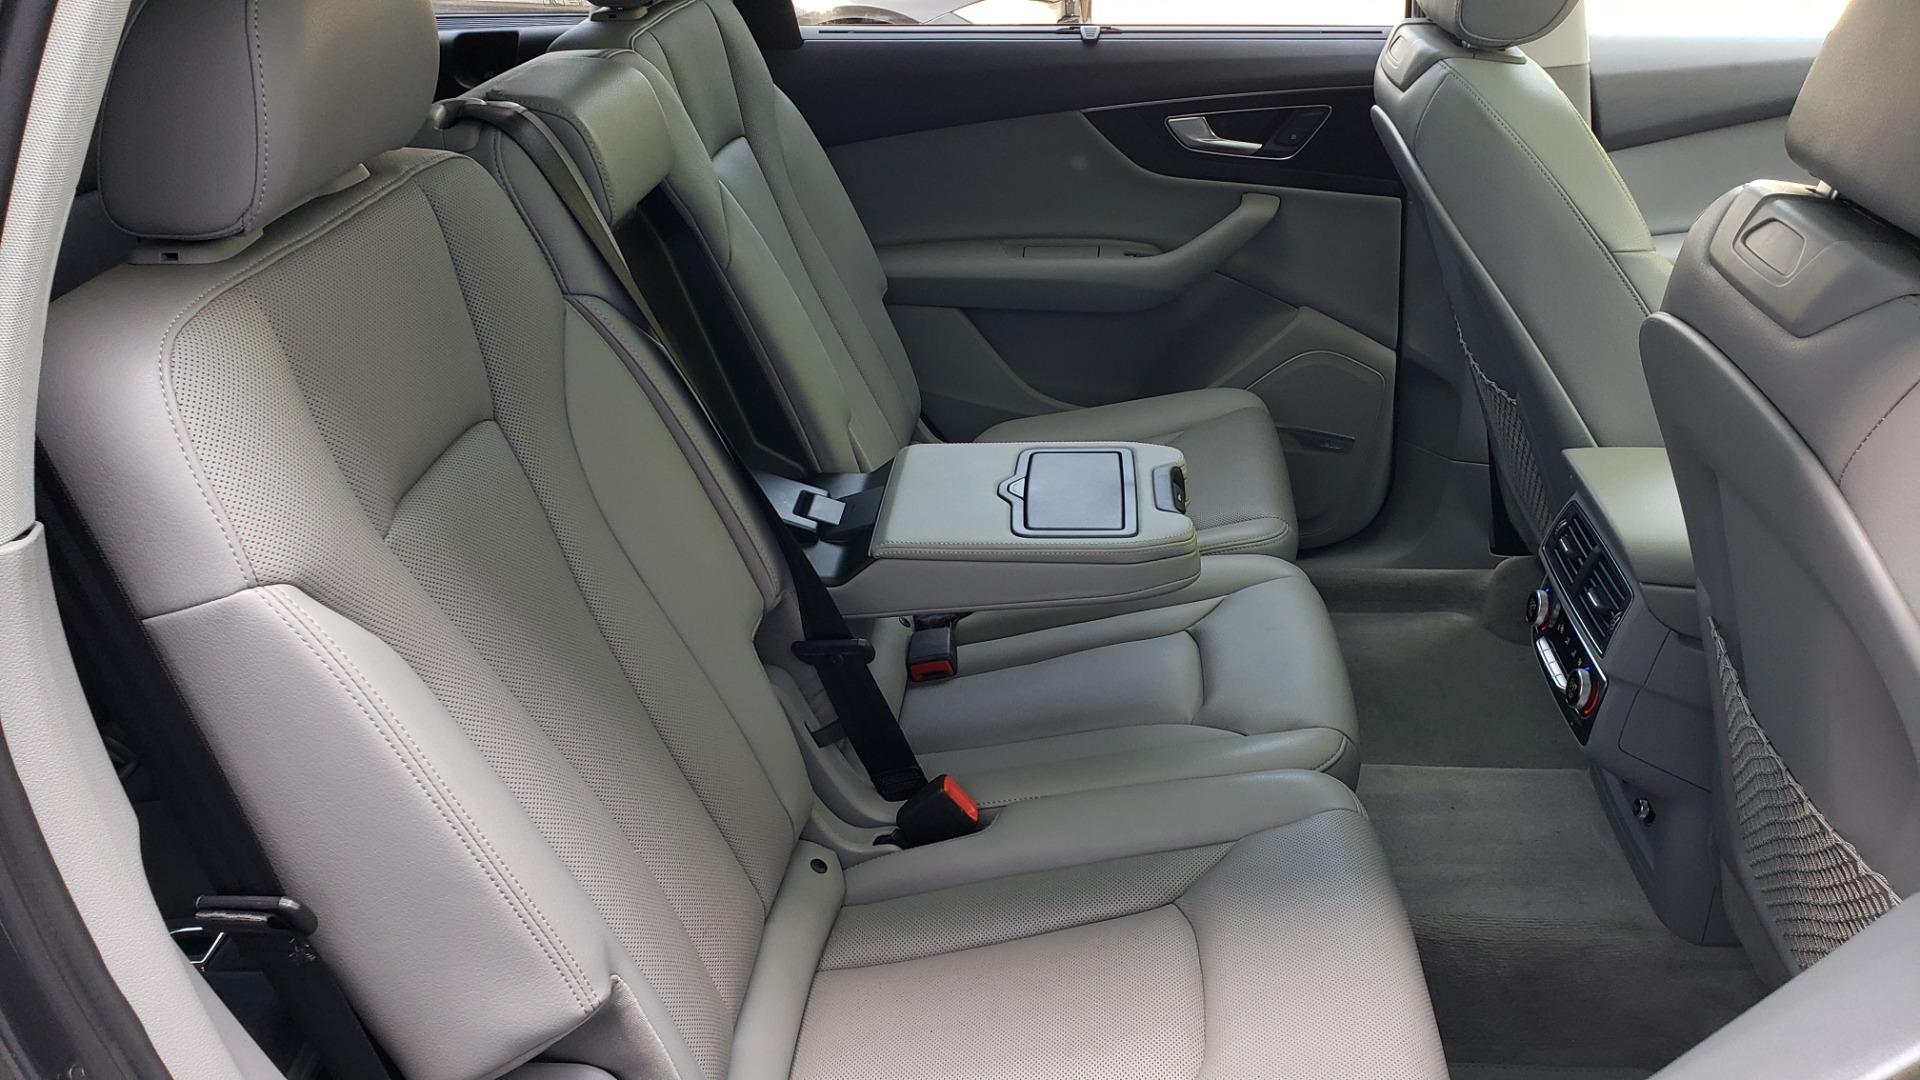 Used 2018 Audi Q7 PRESTIGE TIPTRONIC / NAV / SUNROOF / ADAPTIVE PKG / DRVR ASST / CLD WTHR /  for sale $49,995 at Formula Imports in Charlotte NC 28227 78